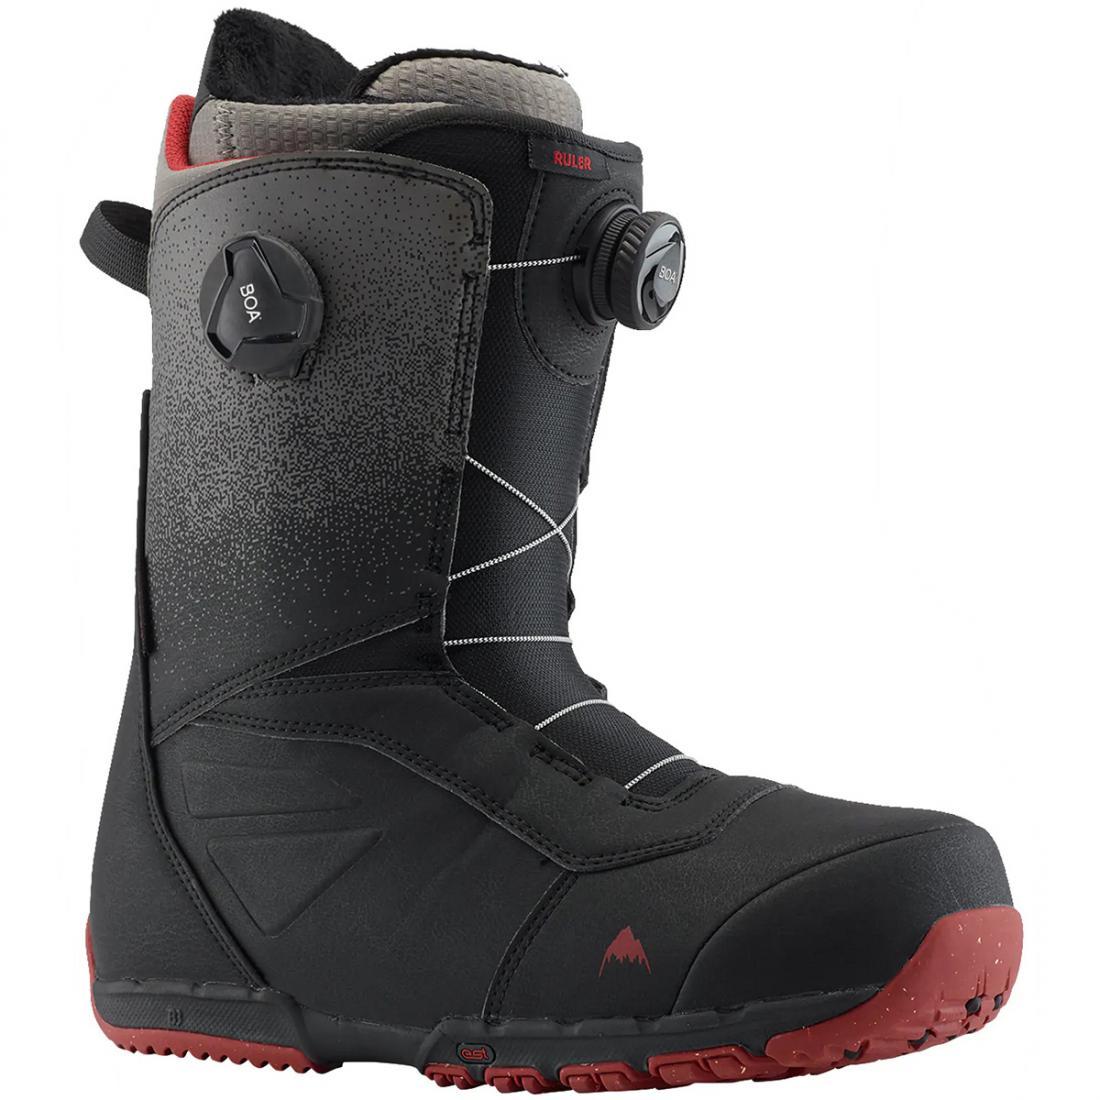 Ботинки для сноуборда Burton Ruler Boa Snowboard Boot купить в Boardshop №1